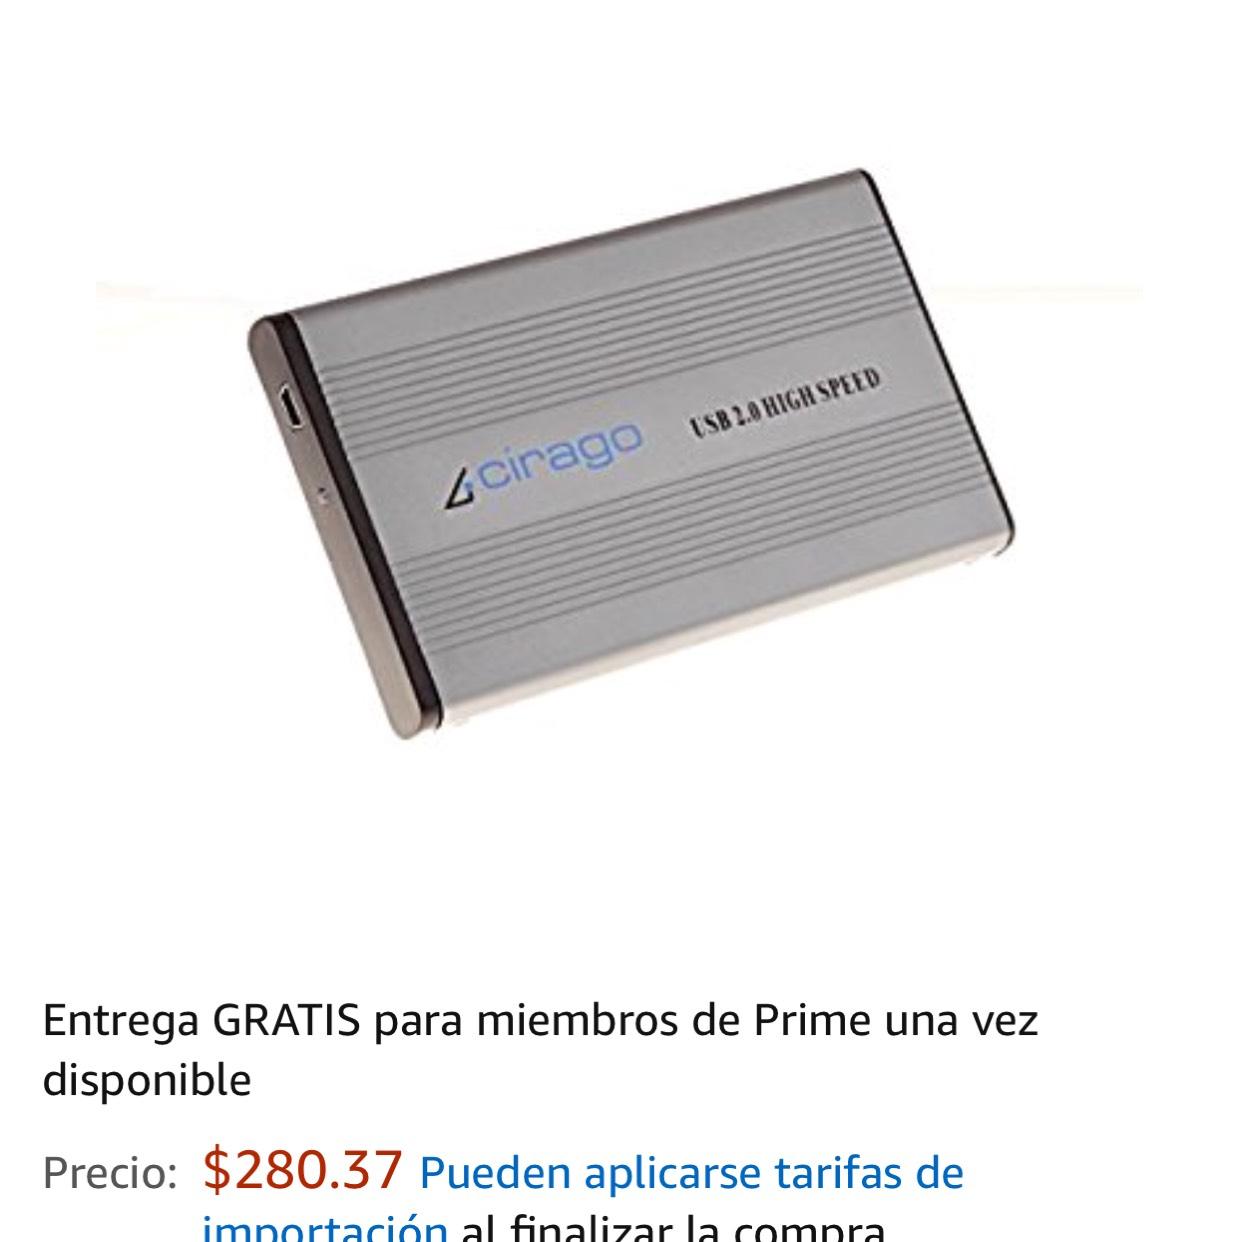 Amazon: Case para Disco Duró Portatil Cirago cst1000 usb2.0 (Envió Gratis Prime)